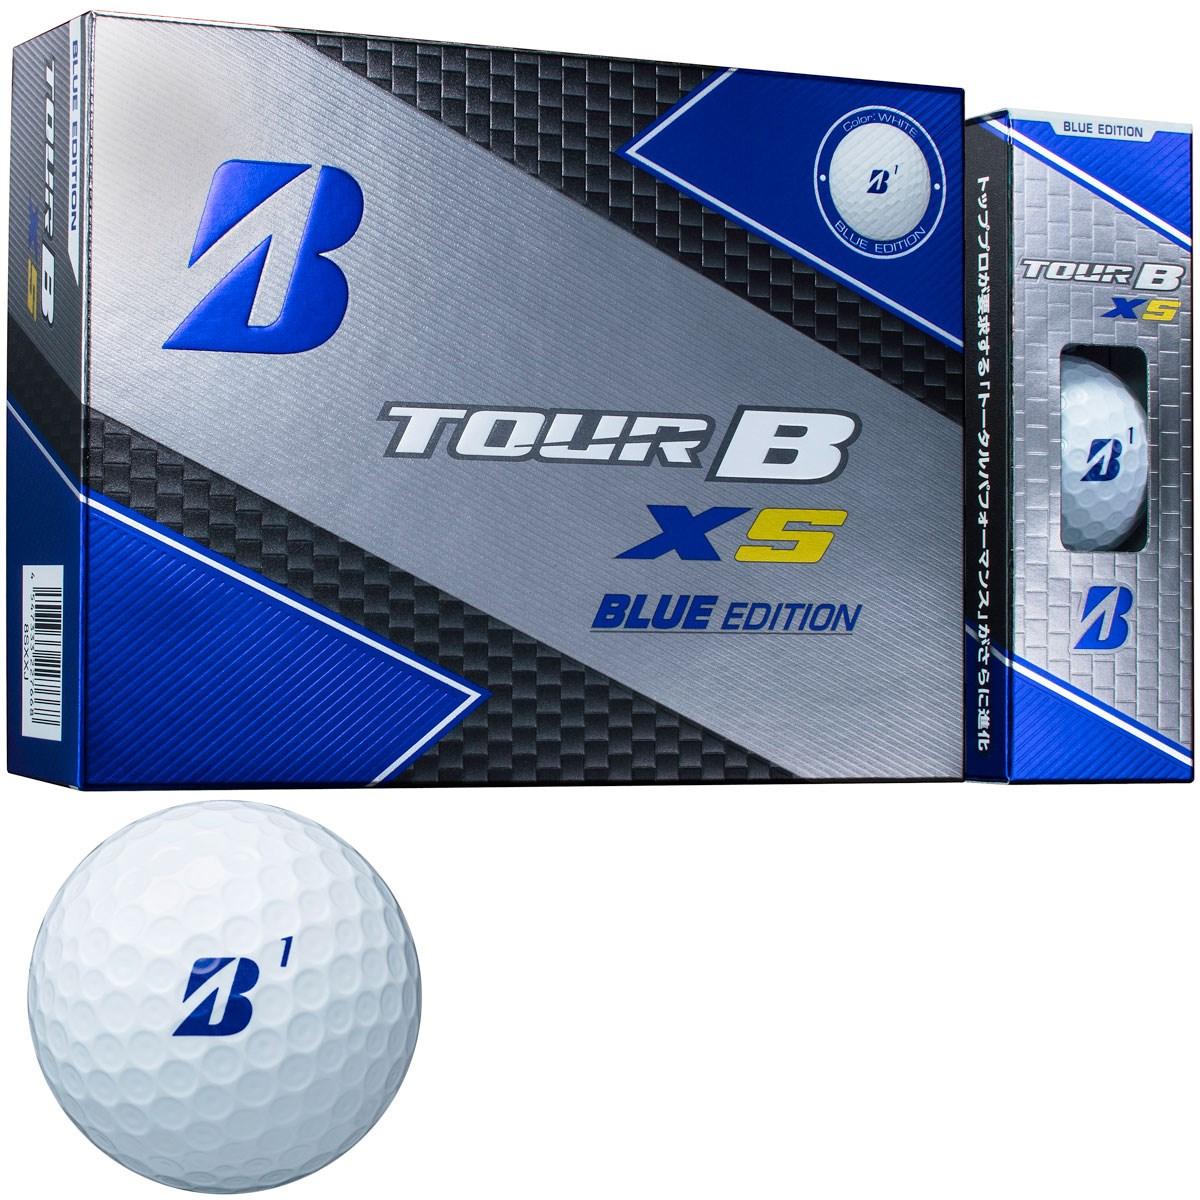 TOUR B XS BLUE EDITION ボール